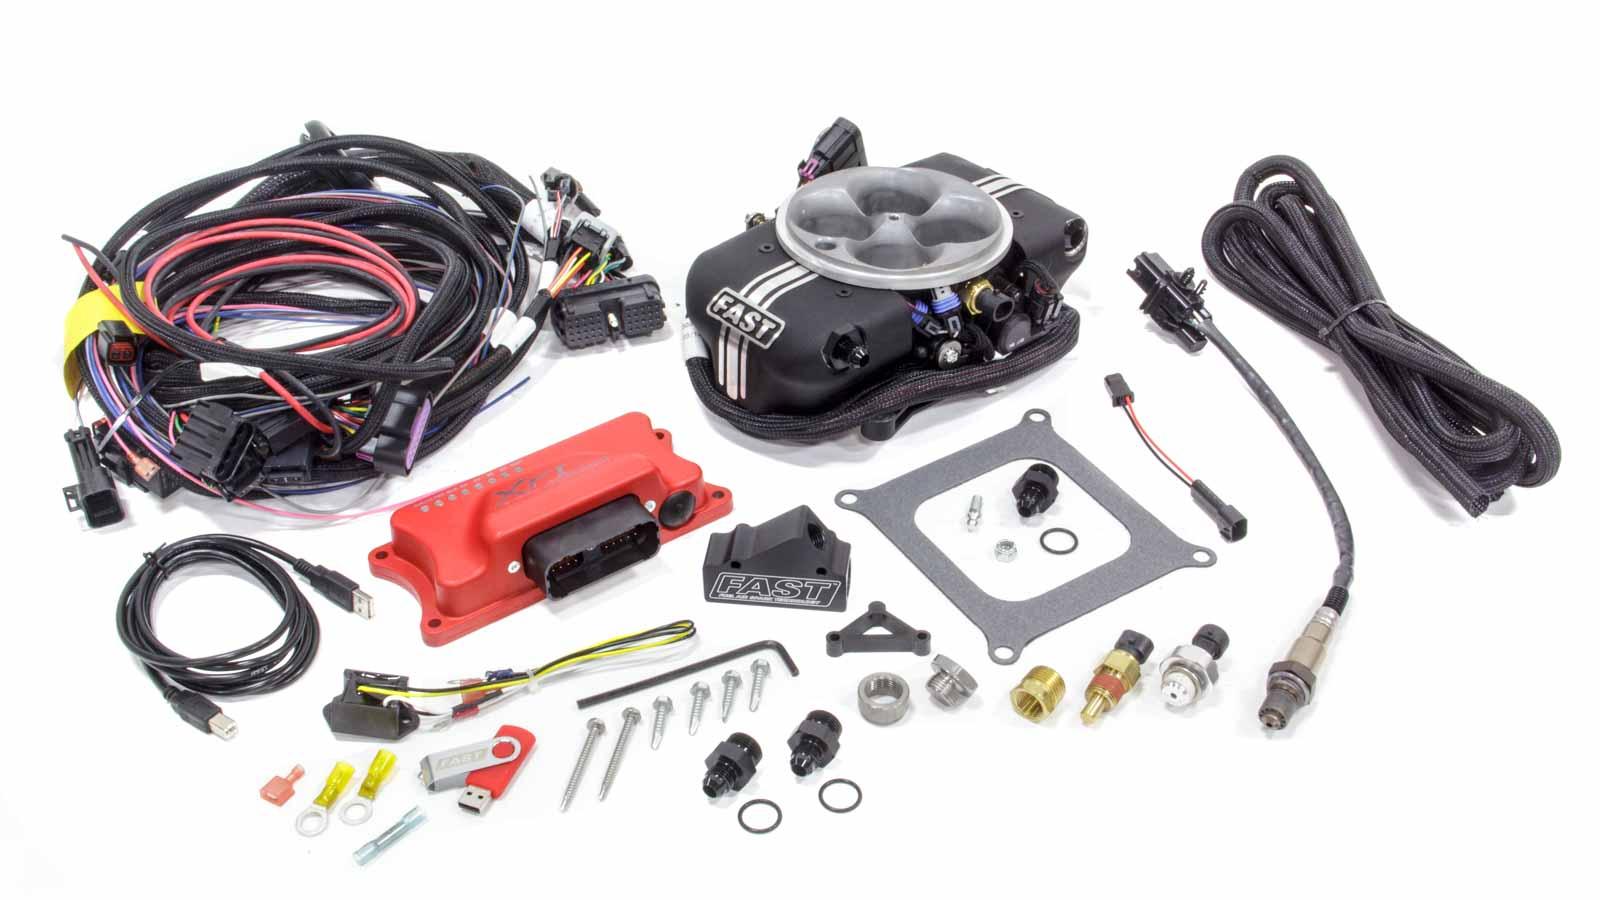 Details about FAST 1100 CFM Throttle Body XFI Sportsman Fuel Injection Kit  P/N 303001